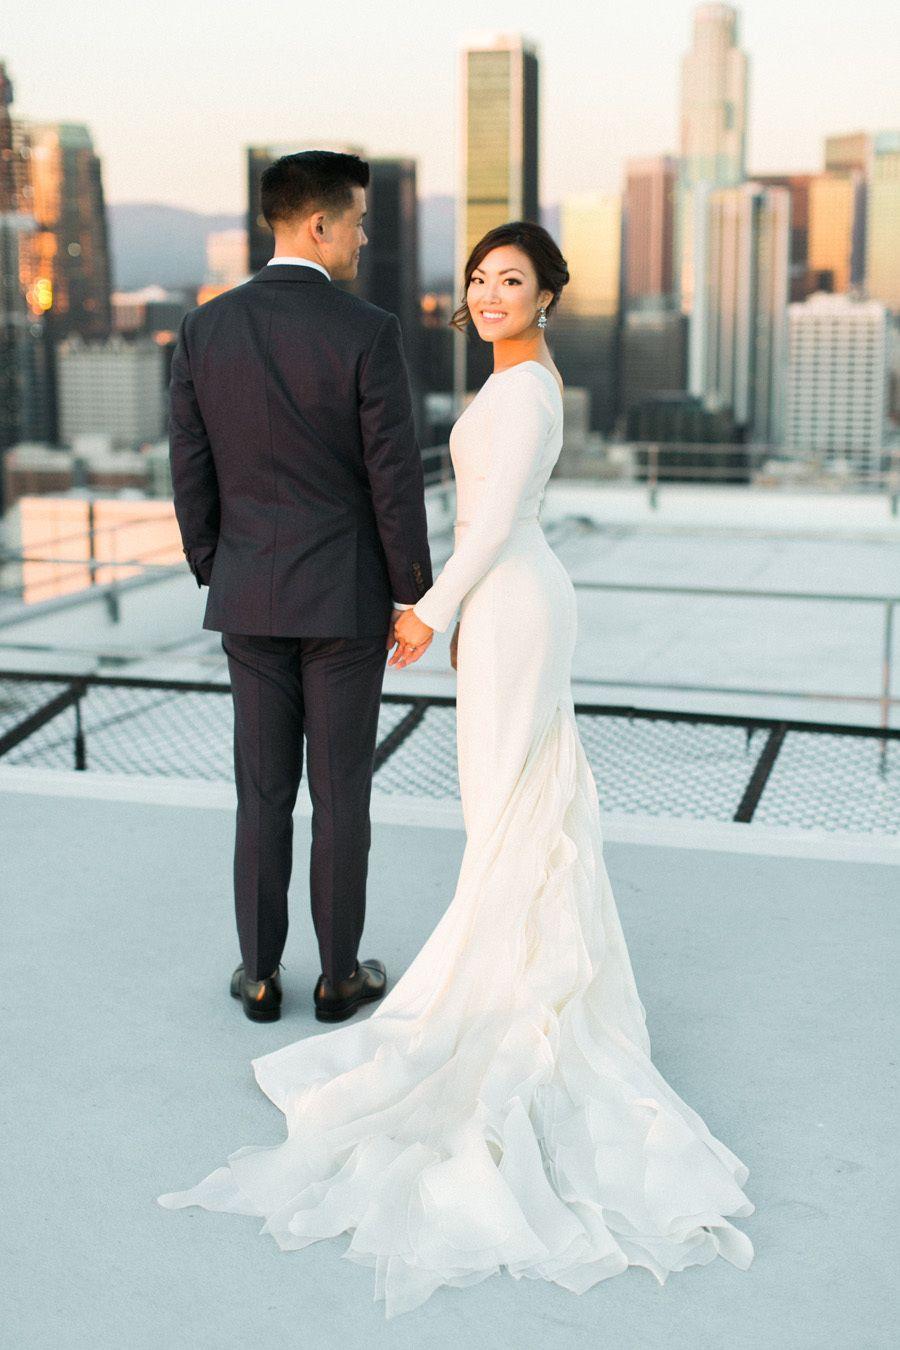 Sleek modern wedding dresses that are redefining classic